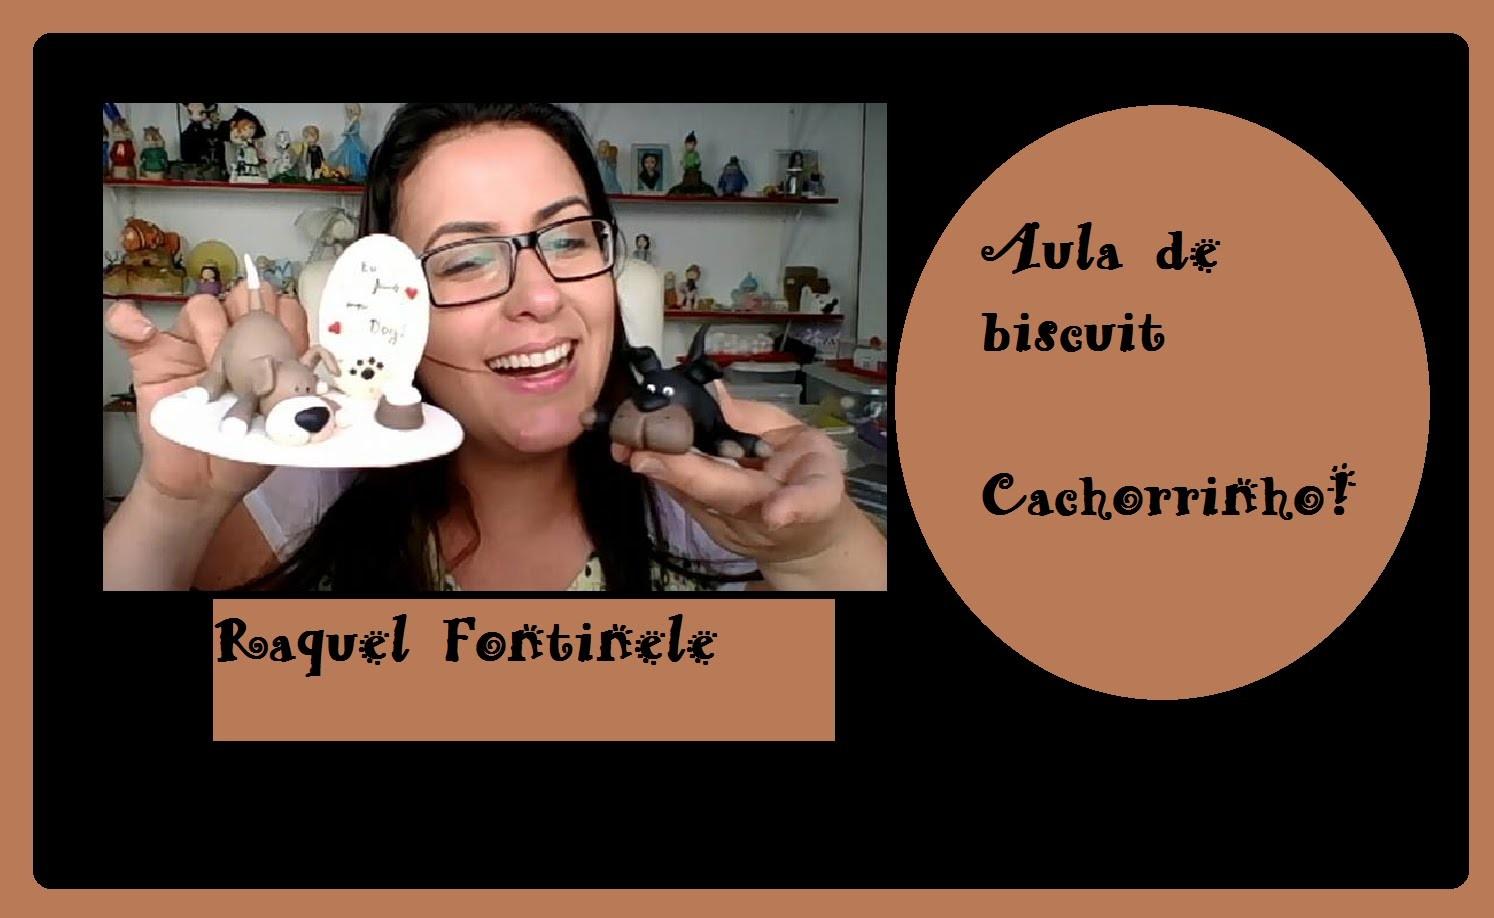 DIY- Cachorrinho em Biscuit - Raquel Fontinele